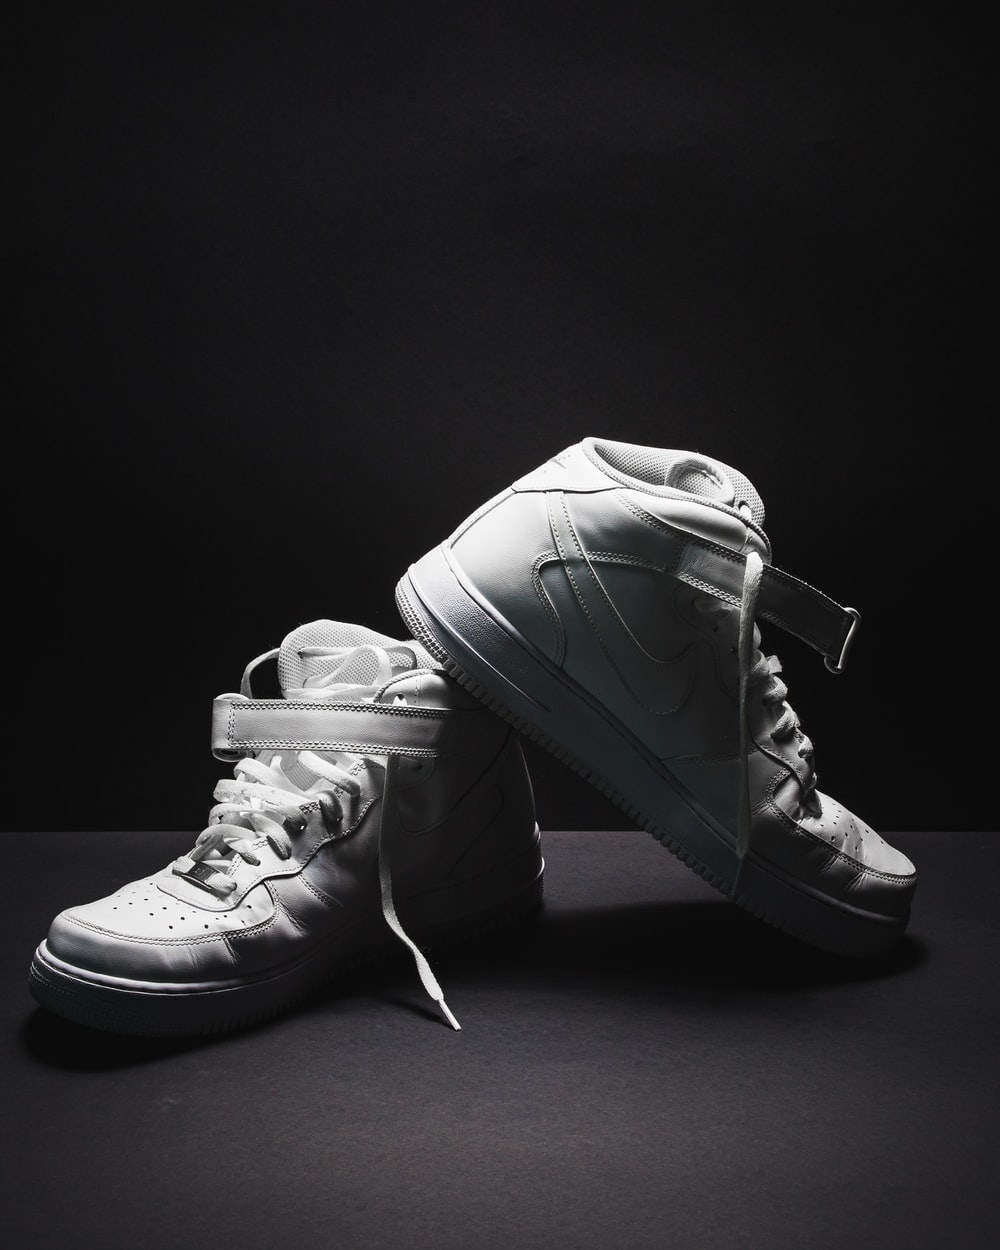 pair of white Nike Air Force 1 sneakers